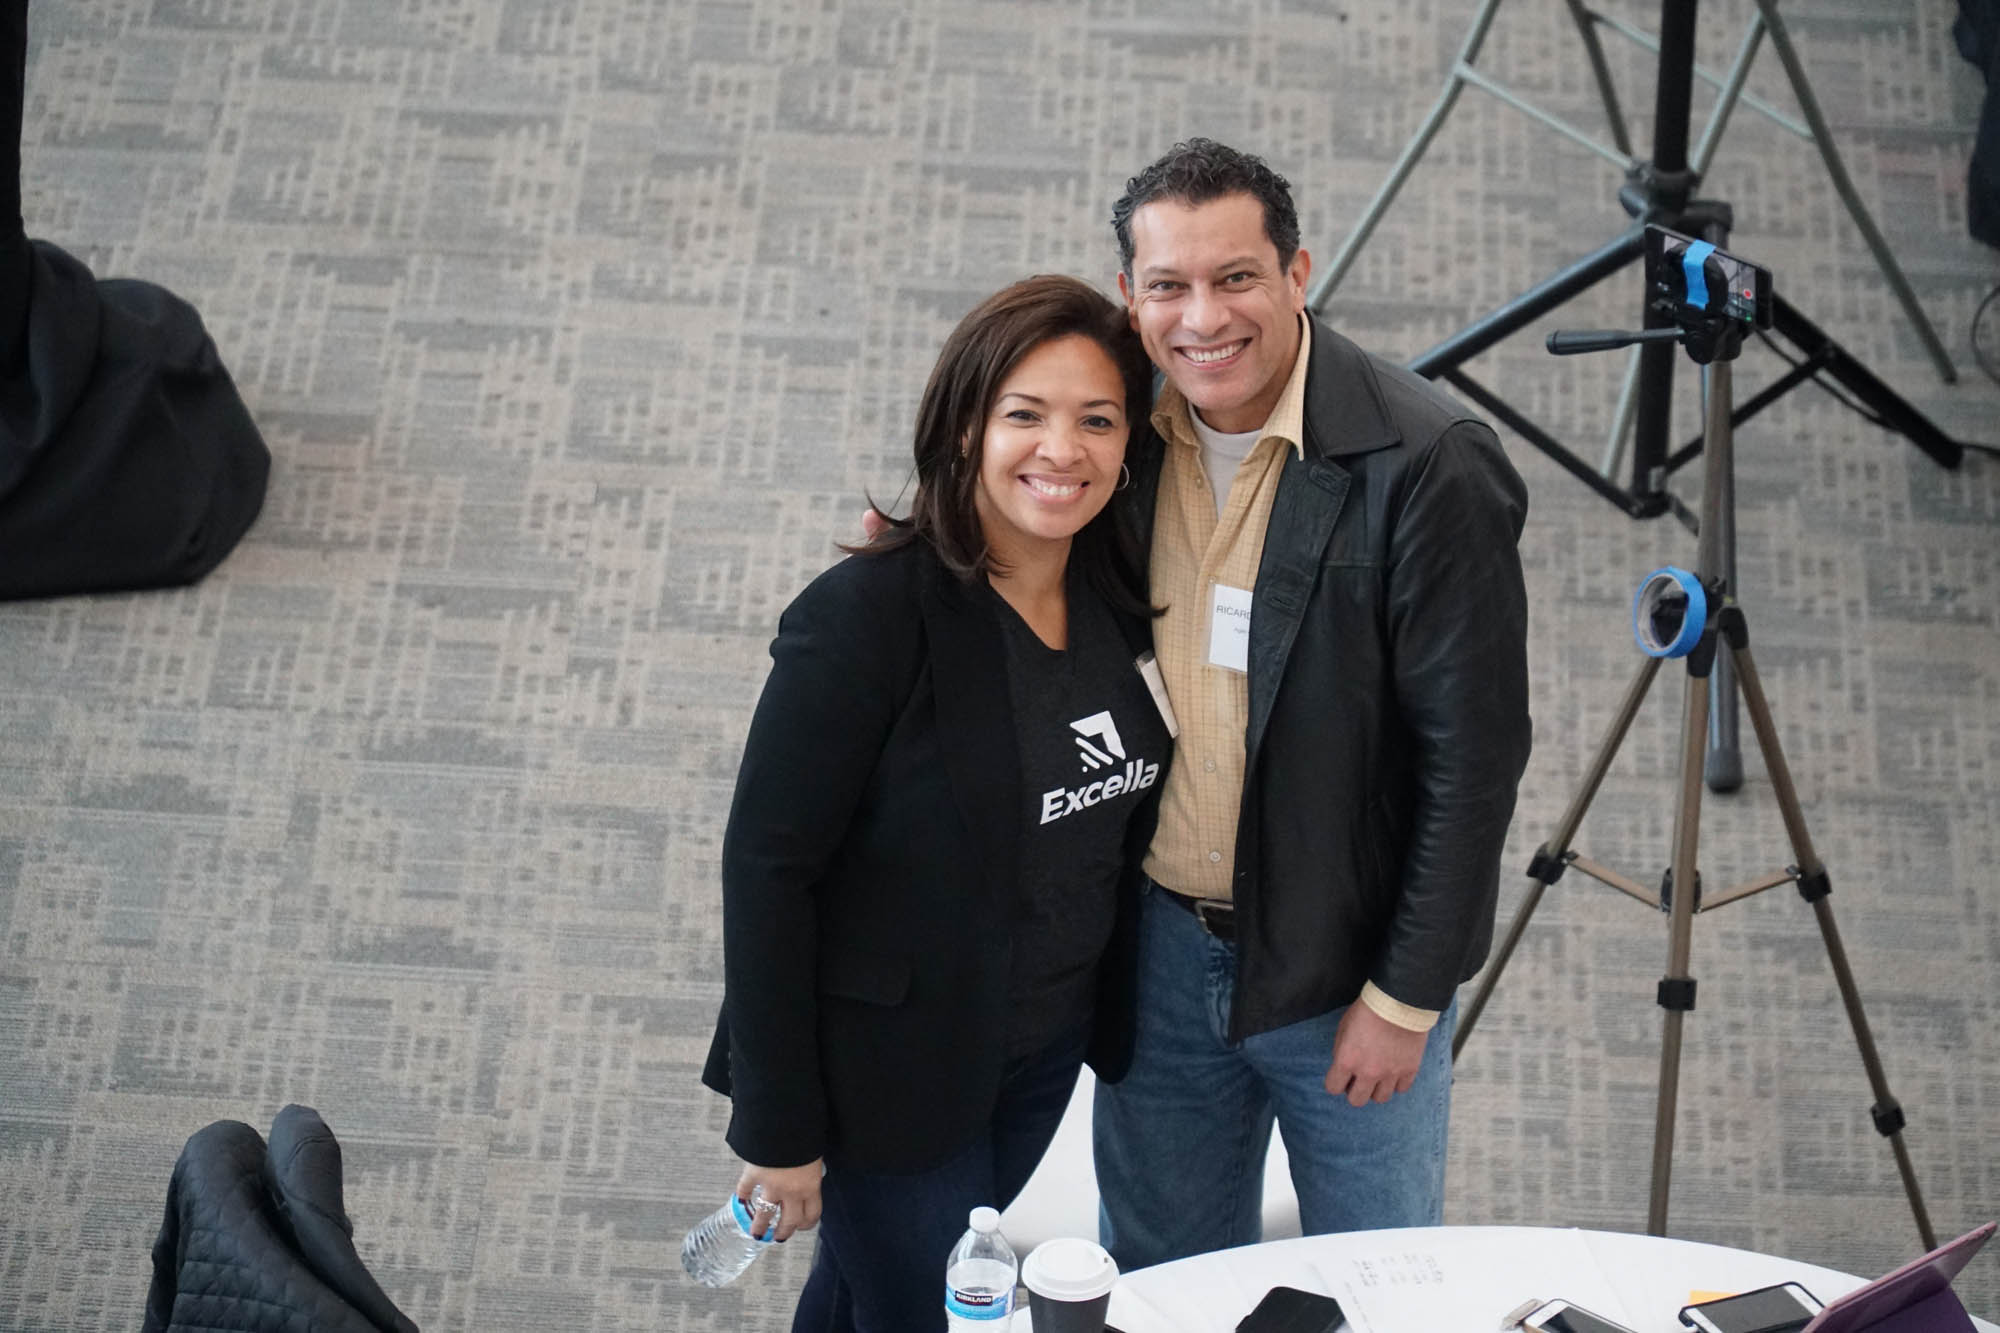 Nicole Spence-Goon & Ricardo Abella @ Agile Charm